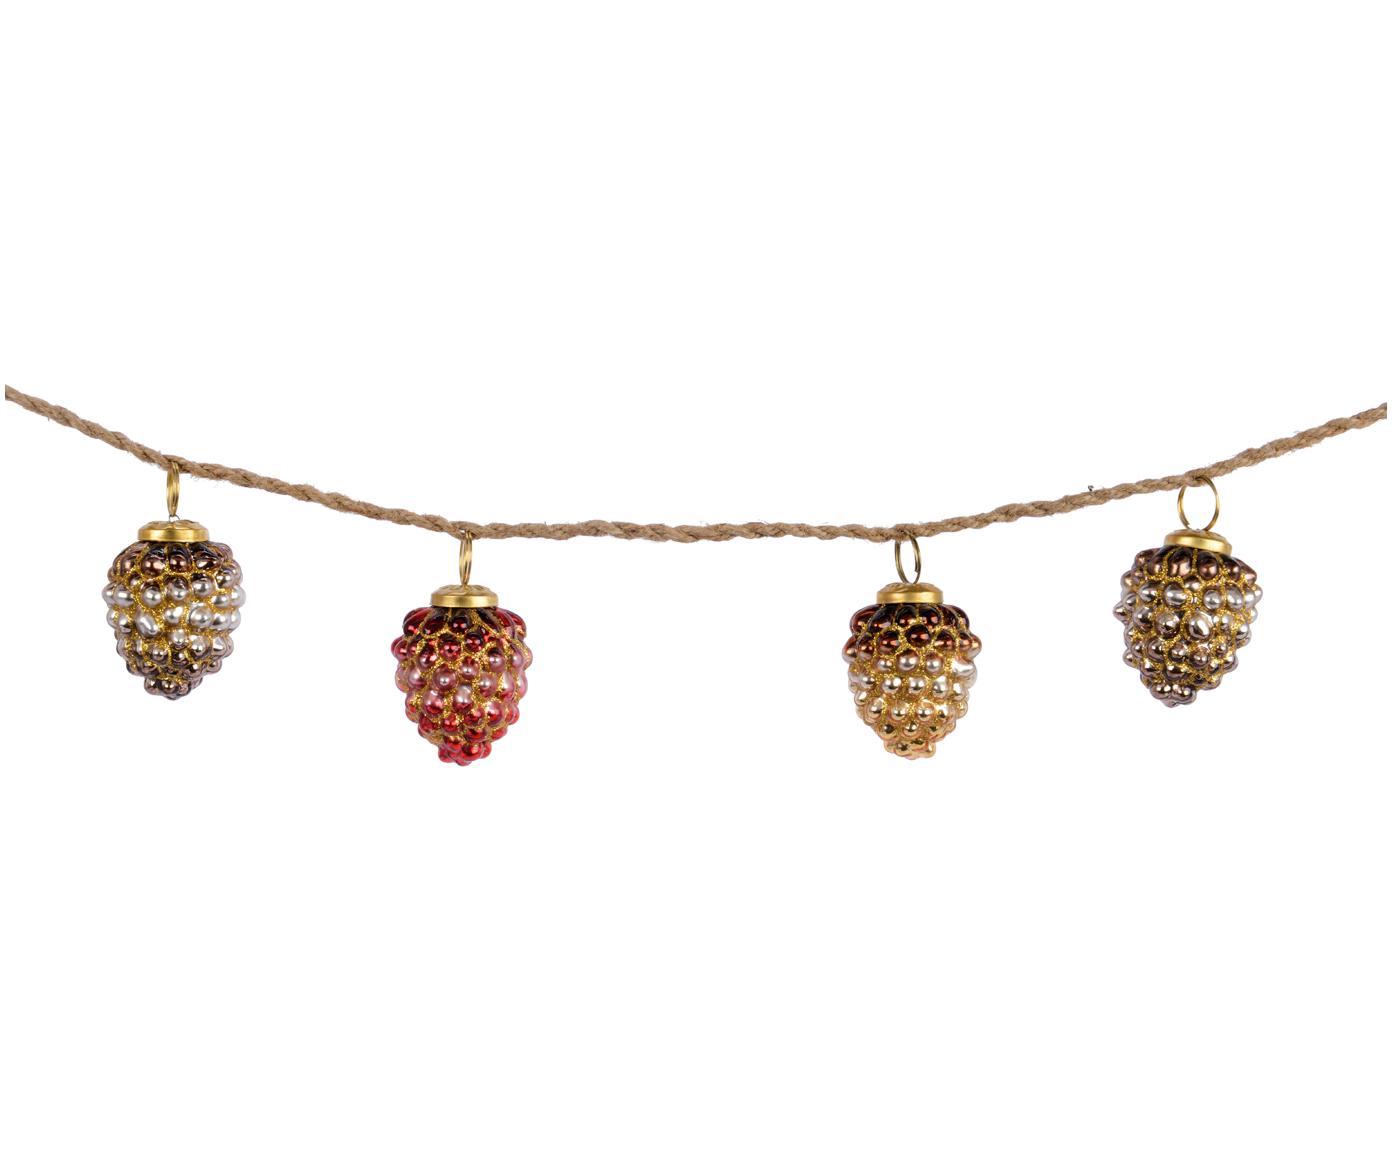 Guirnalda Zapfen, Vidrio, Rojo, dorado, L 120 cm